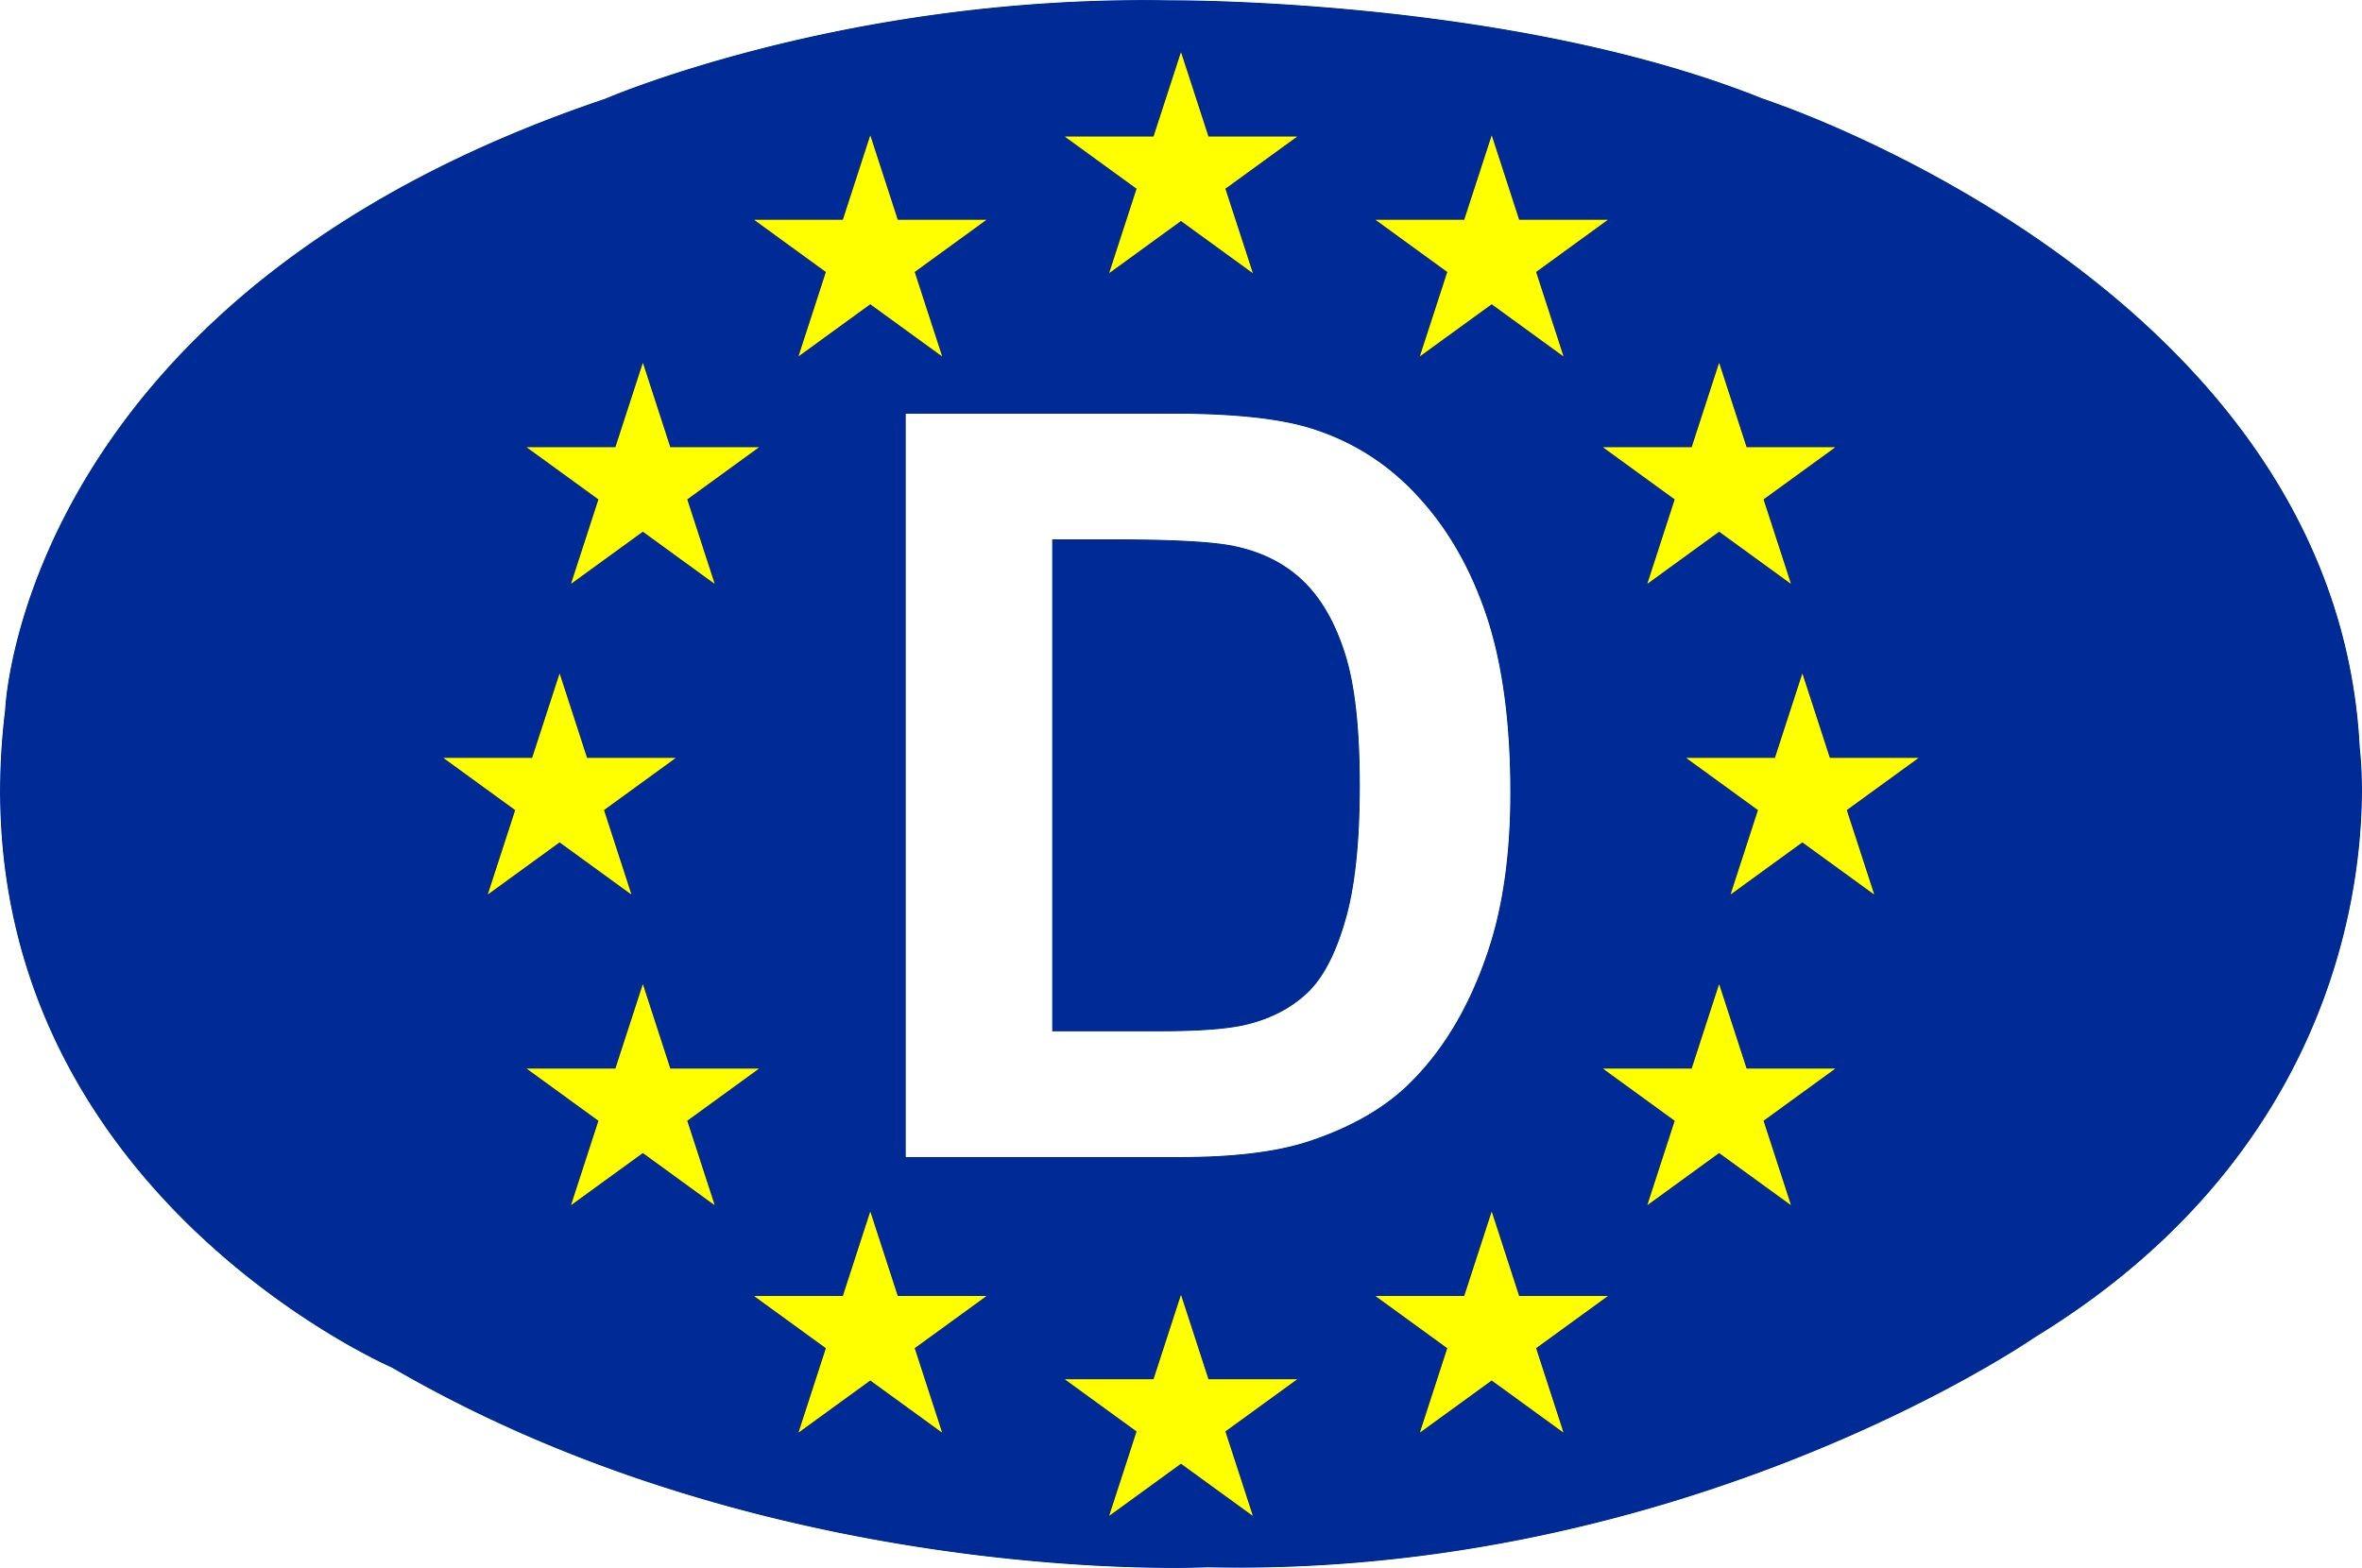 Autocollant Europe-D 125 x 85 mm – Bild 1